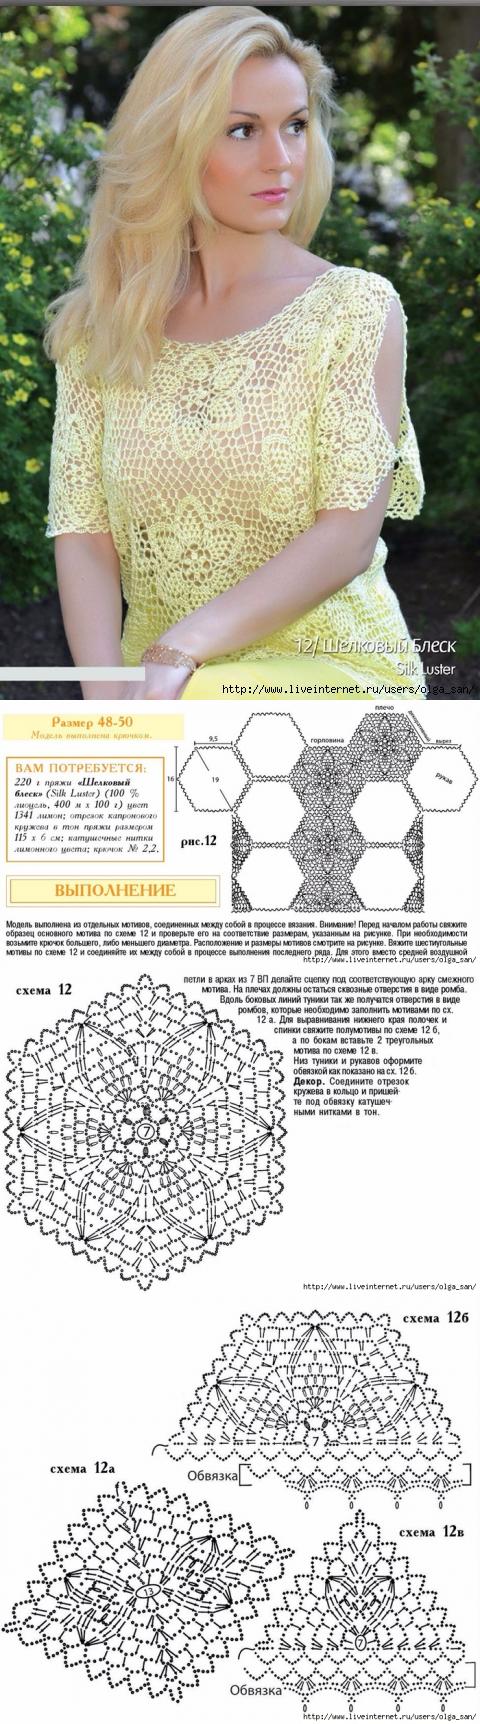 liveinternet.ru | crochet | Pinterest | Blusas, Tejido y Ganchillo